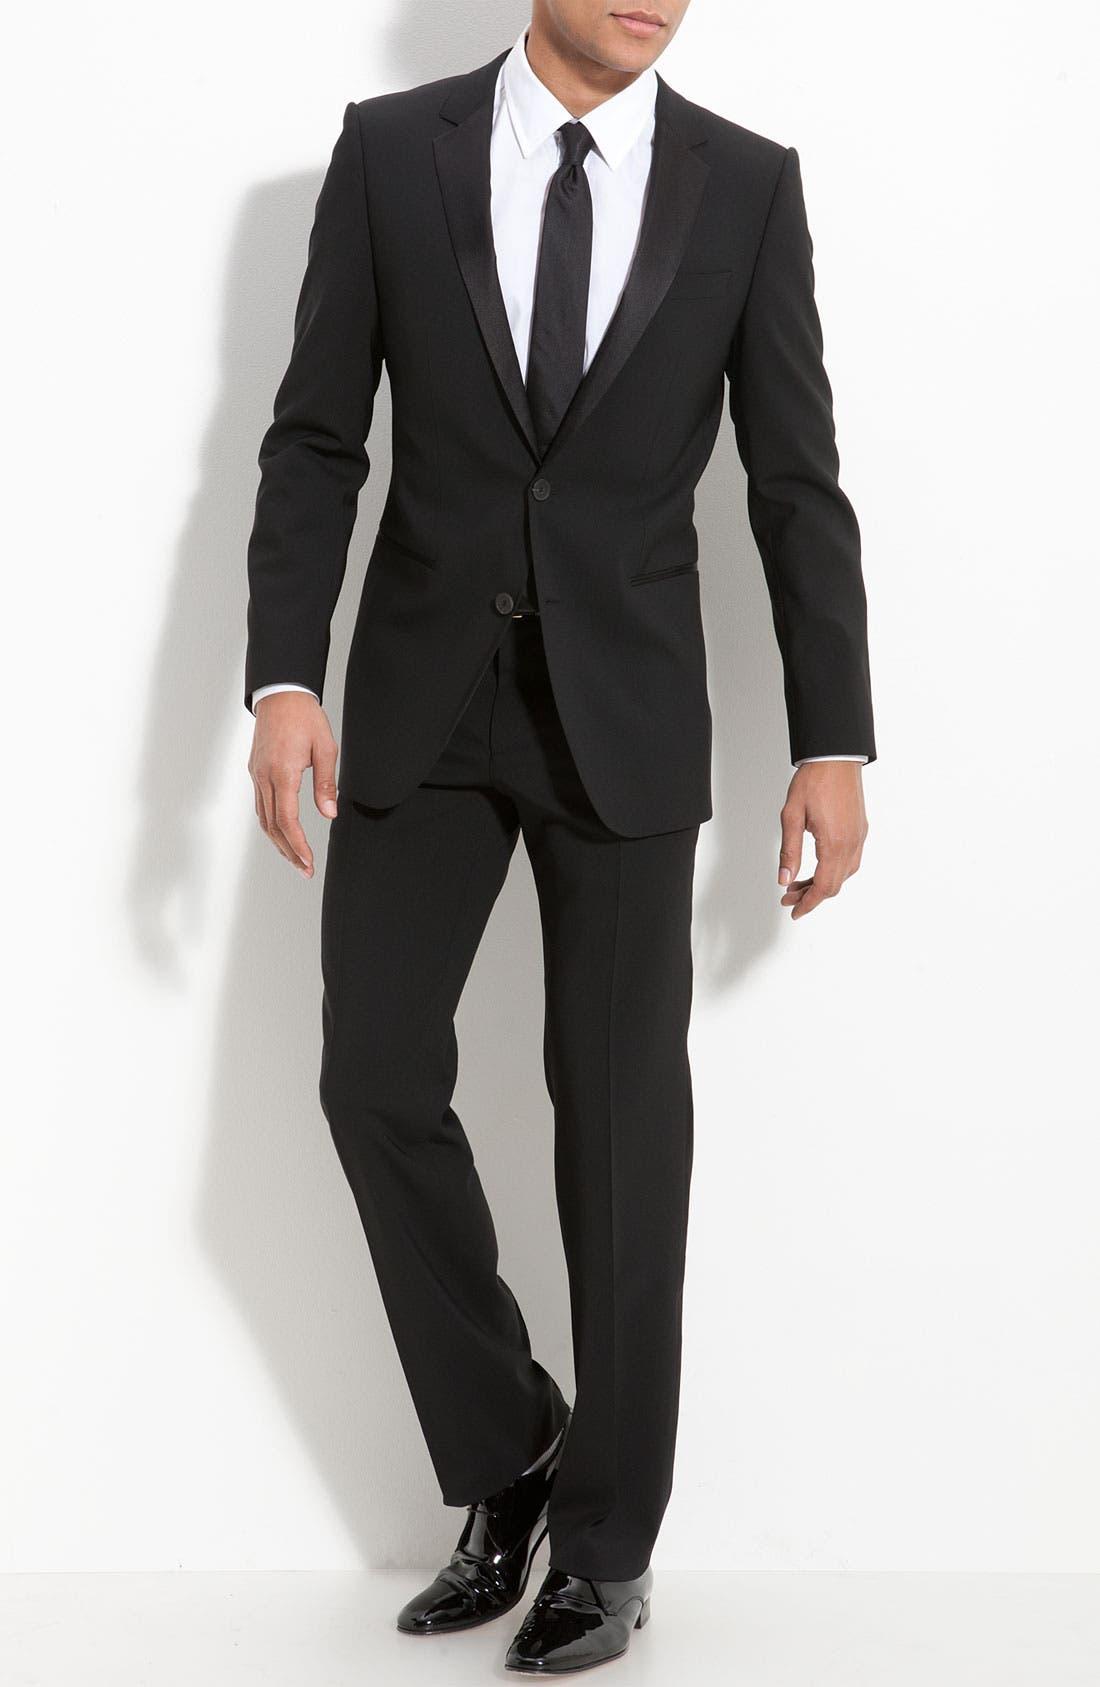 Alternate Image 1 Selected - HUGO 'Aikin Hollo' Trim Fit Wool Tuxedo